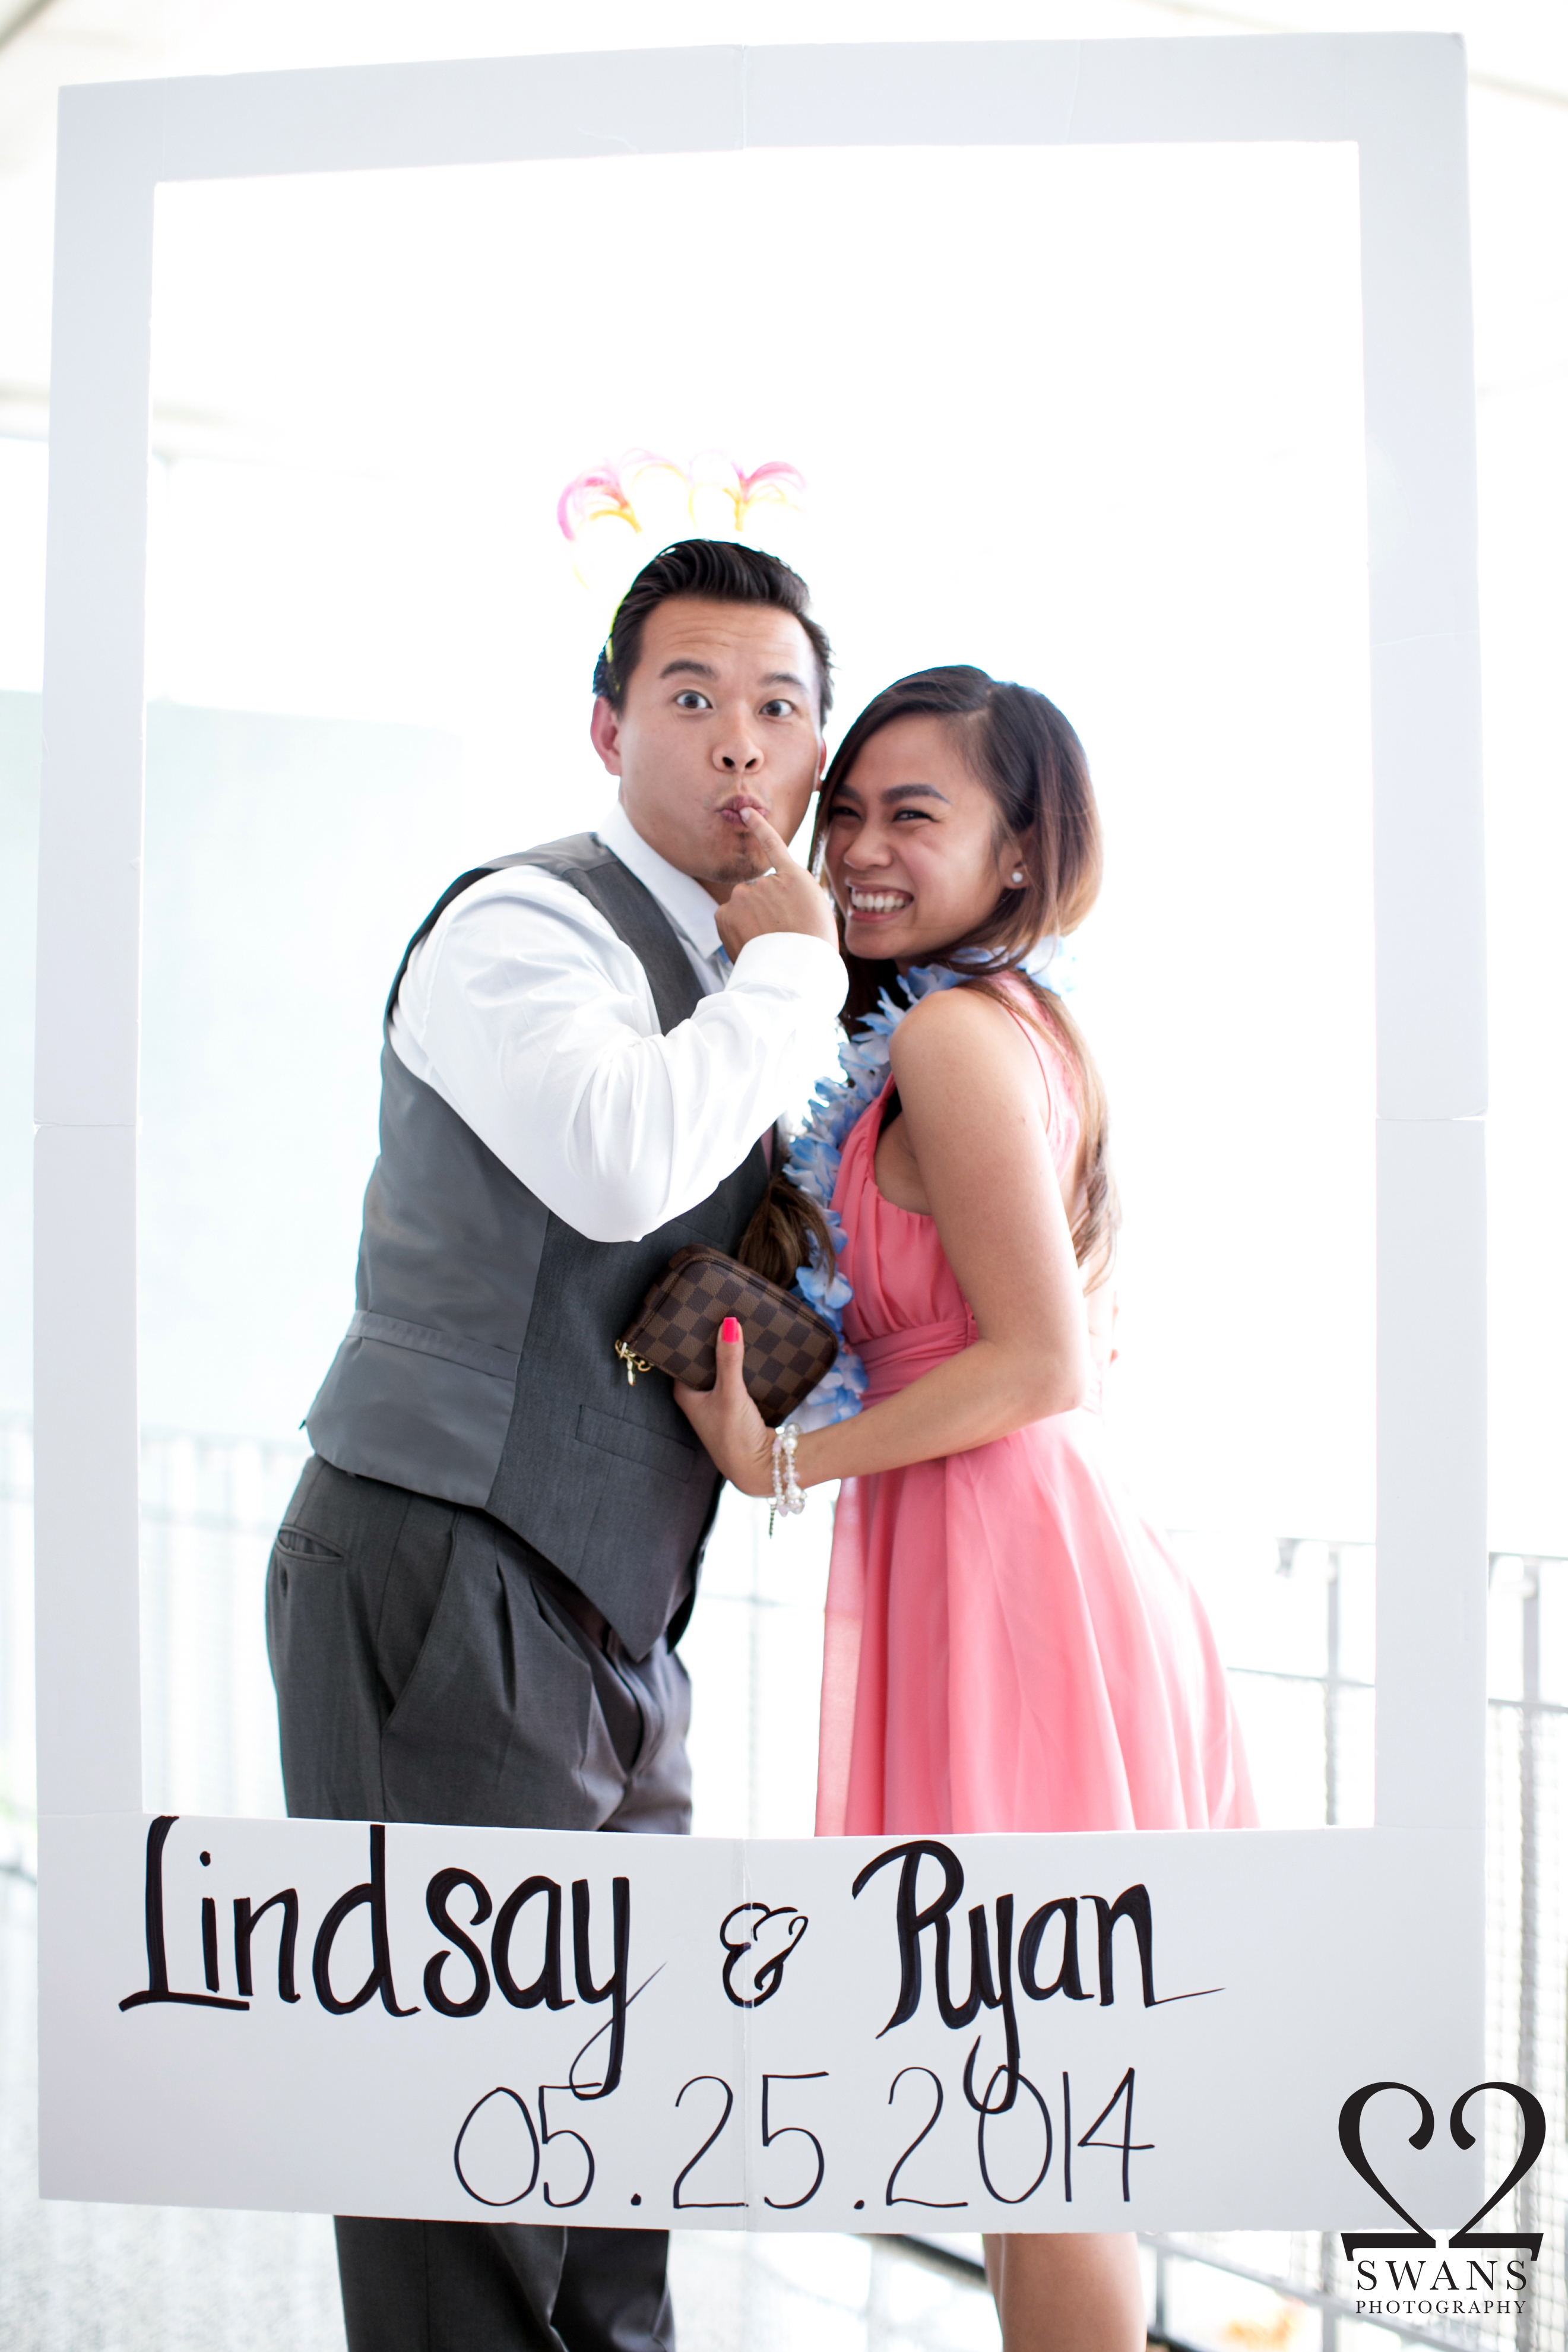 Lindsay & Ryan Wedding Photo Booth ‹ 2Swans Photography2Swans ...